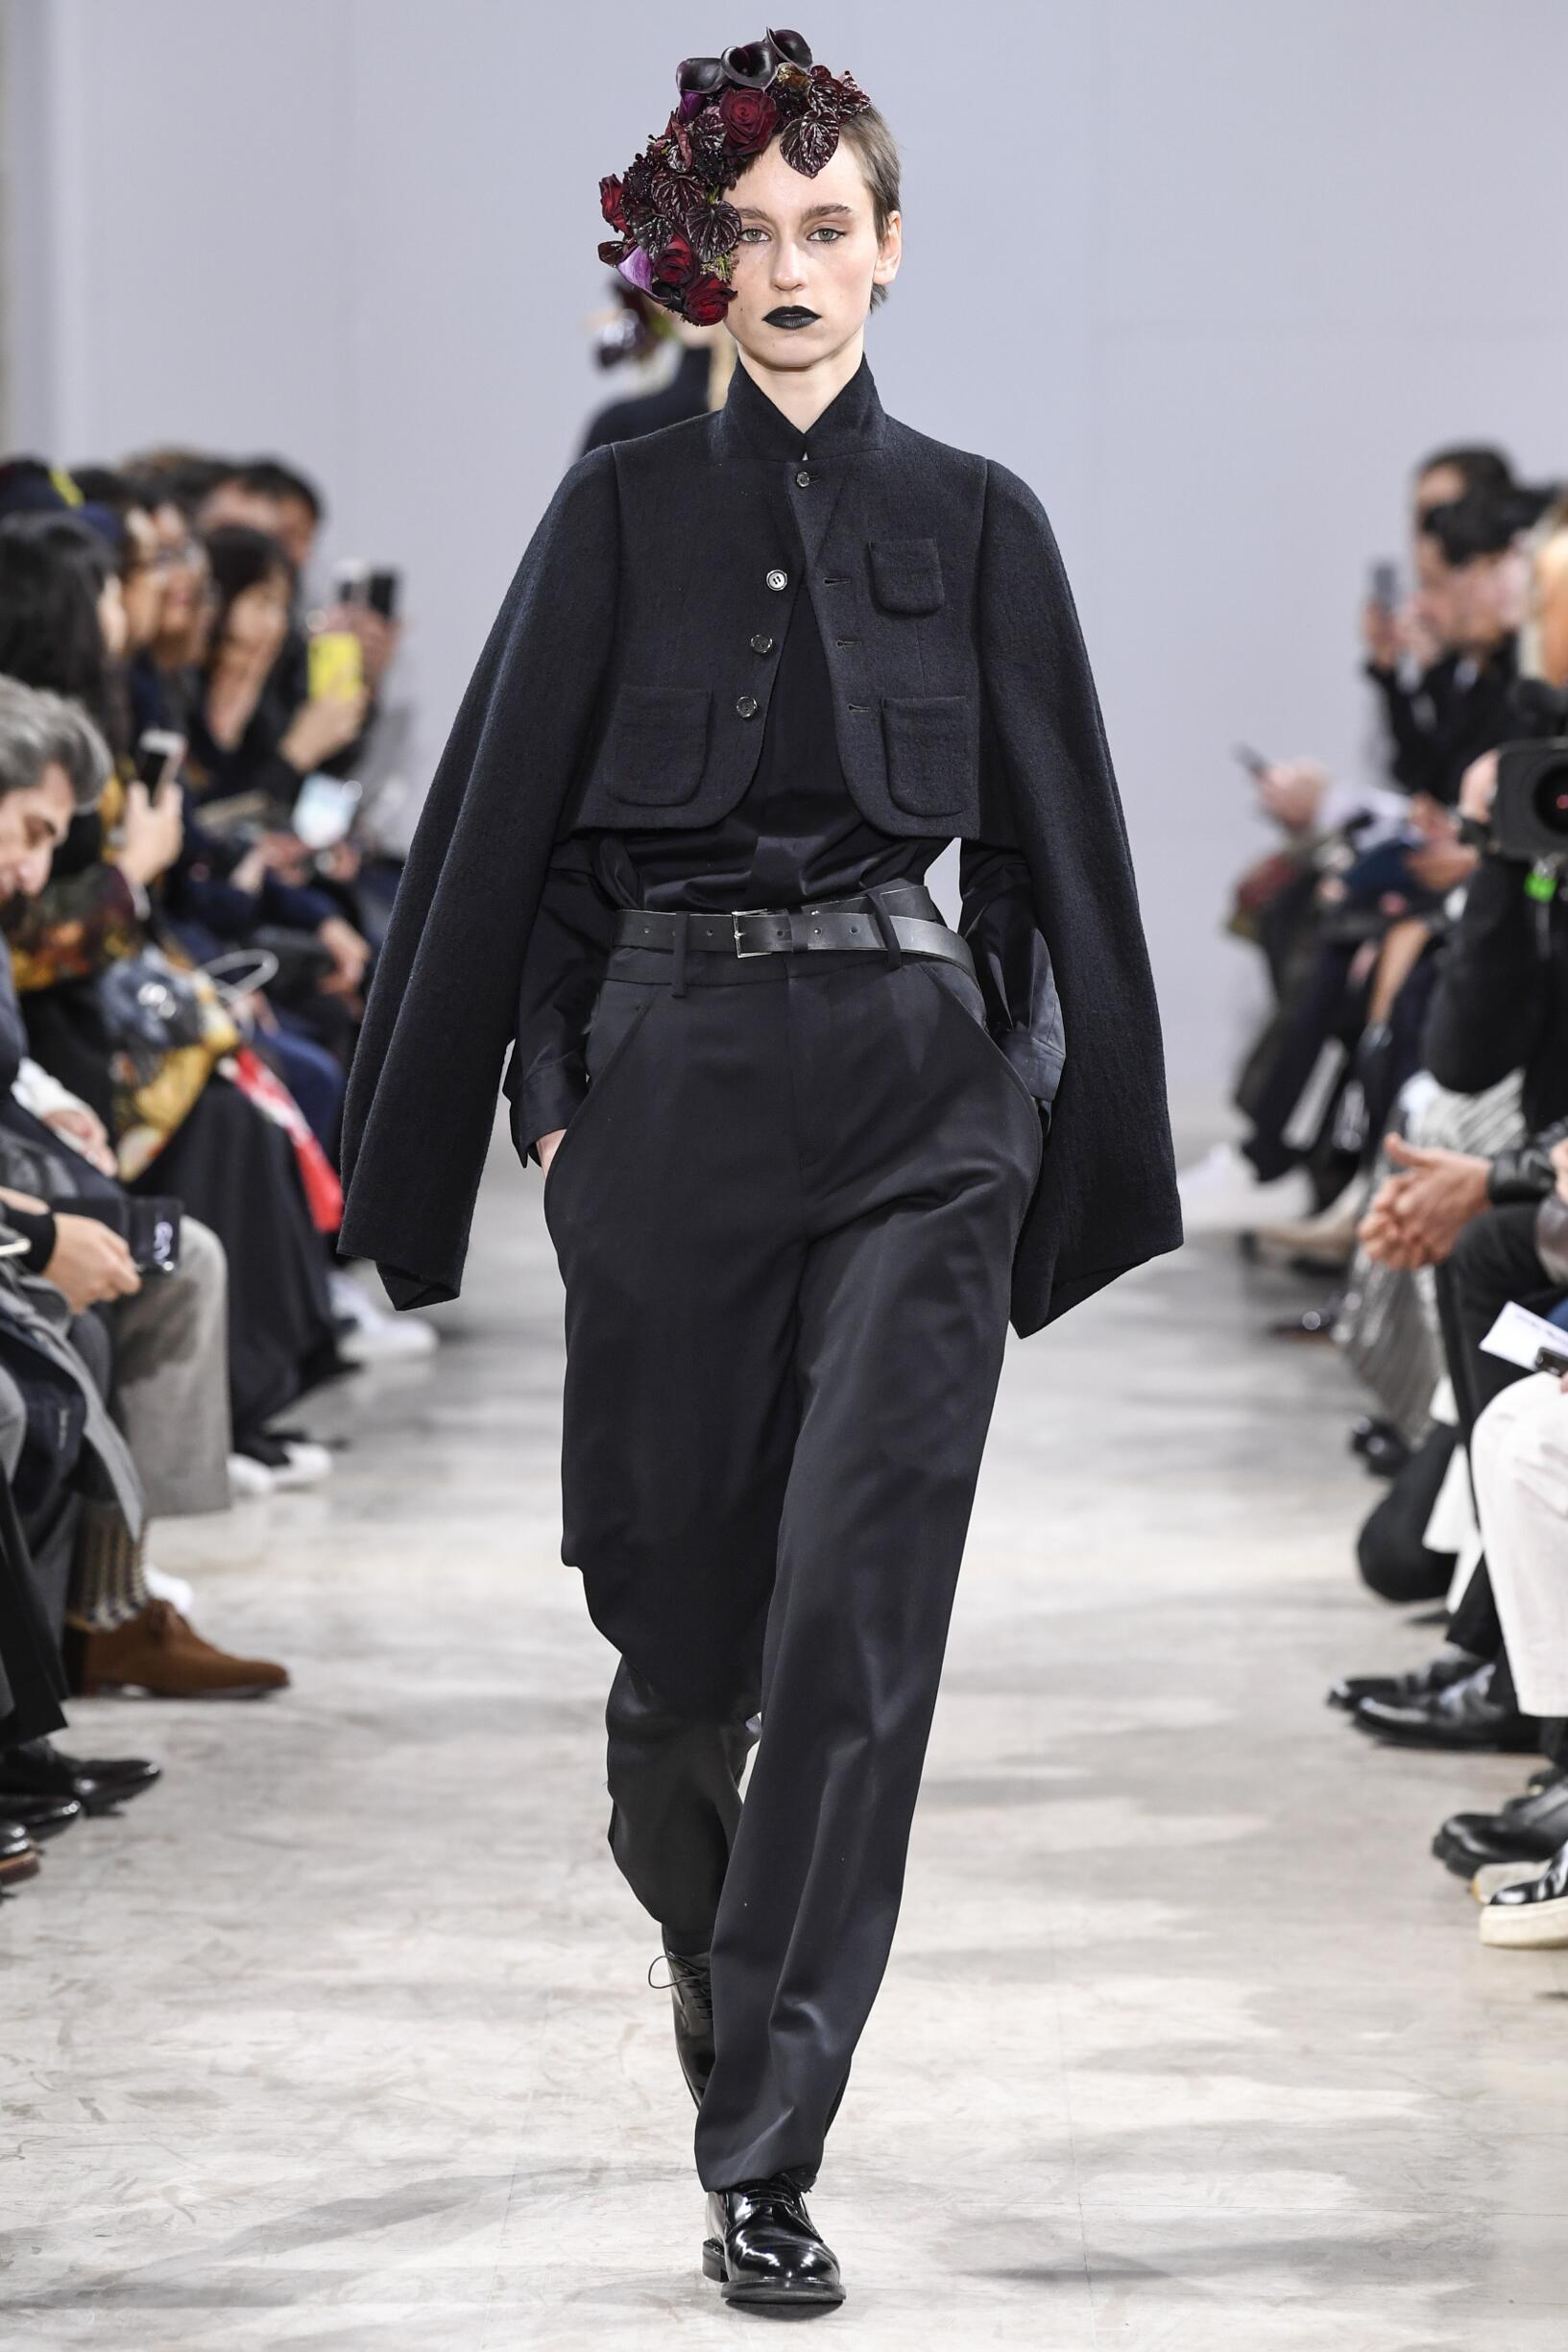 Model Catwalk Noir Kei Ninomiya